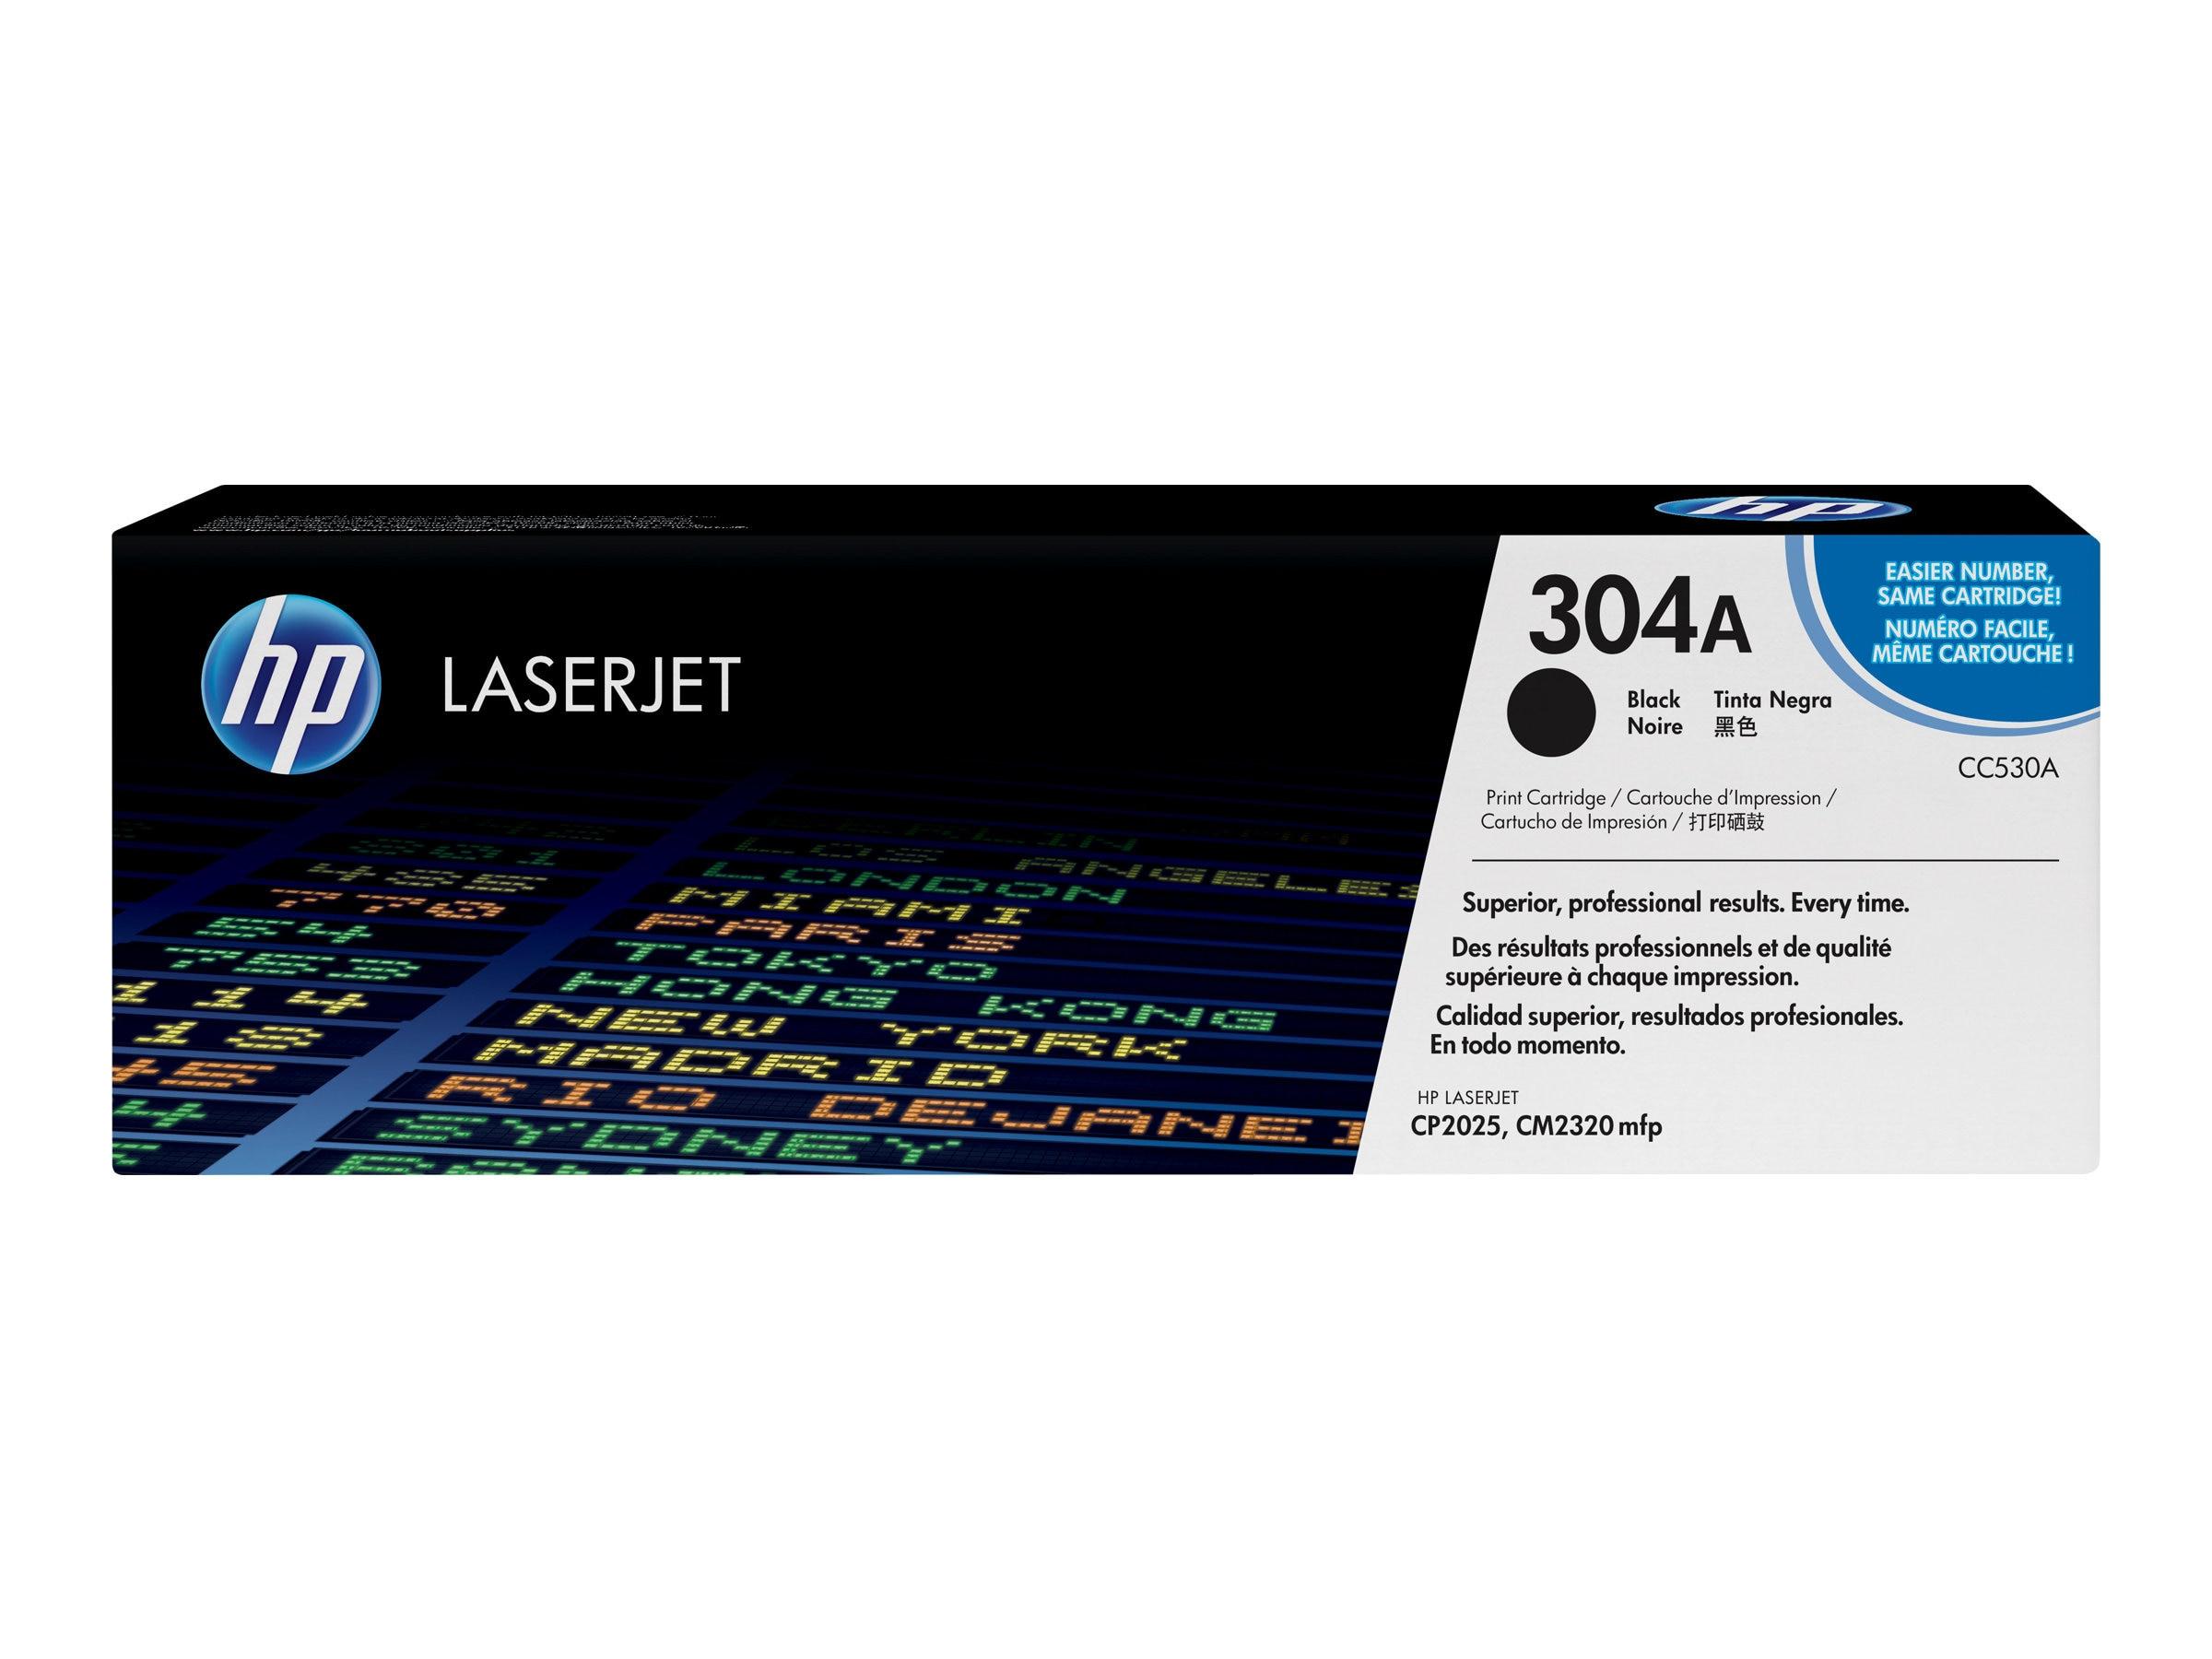 HP 304A (CC530A) Black Original LaserJet Toner Cartridge for HP Color LaserJet CP2025 & CM2320 MFP, CC530A, 8868980, Toner and Imaging Components